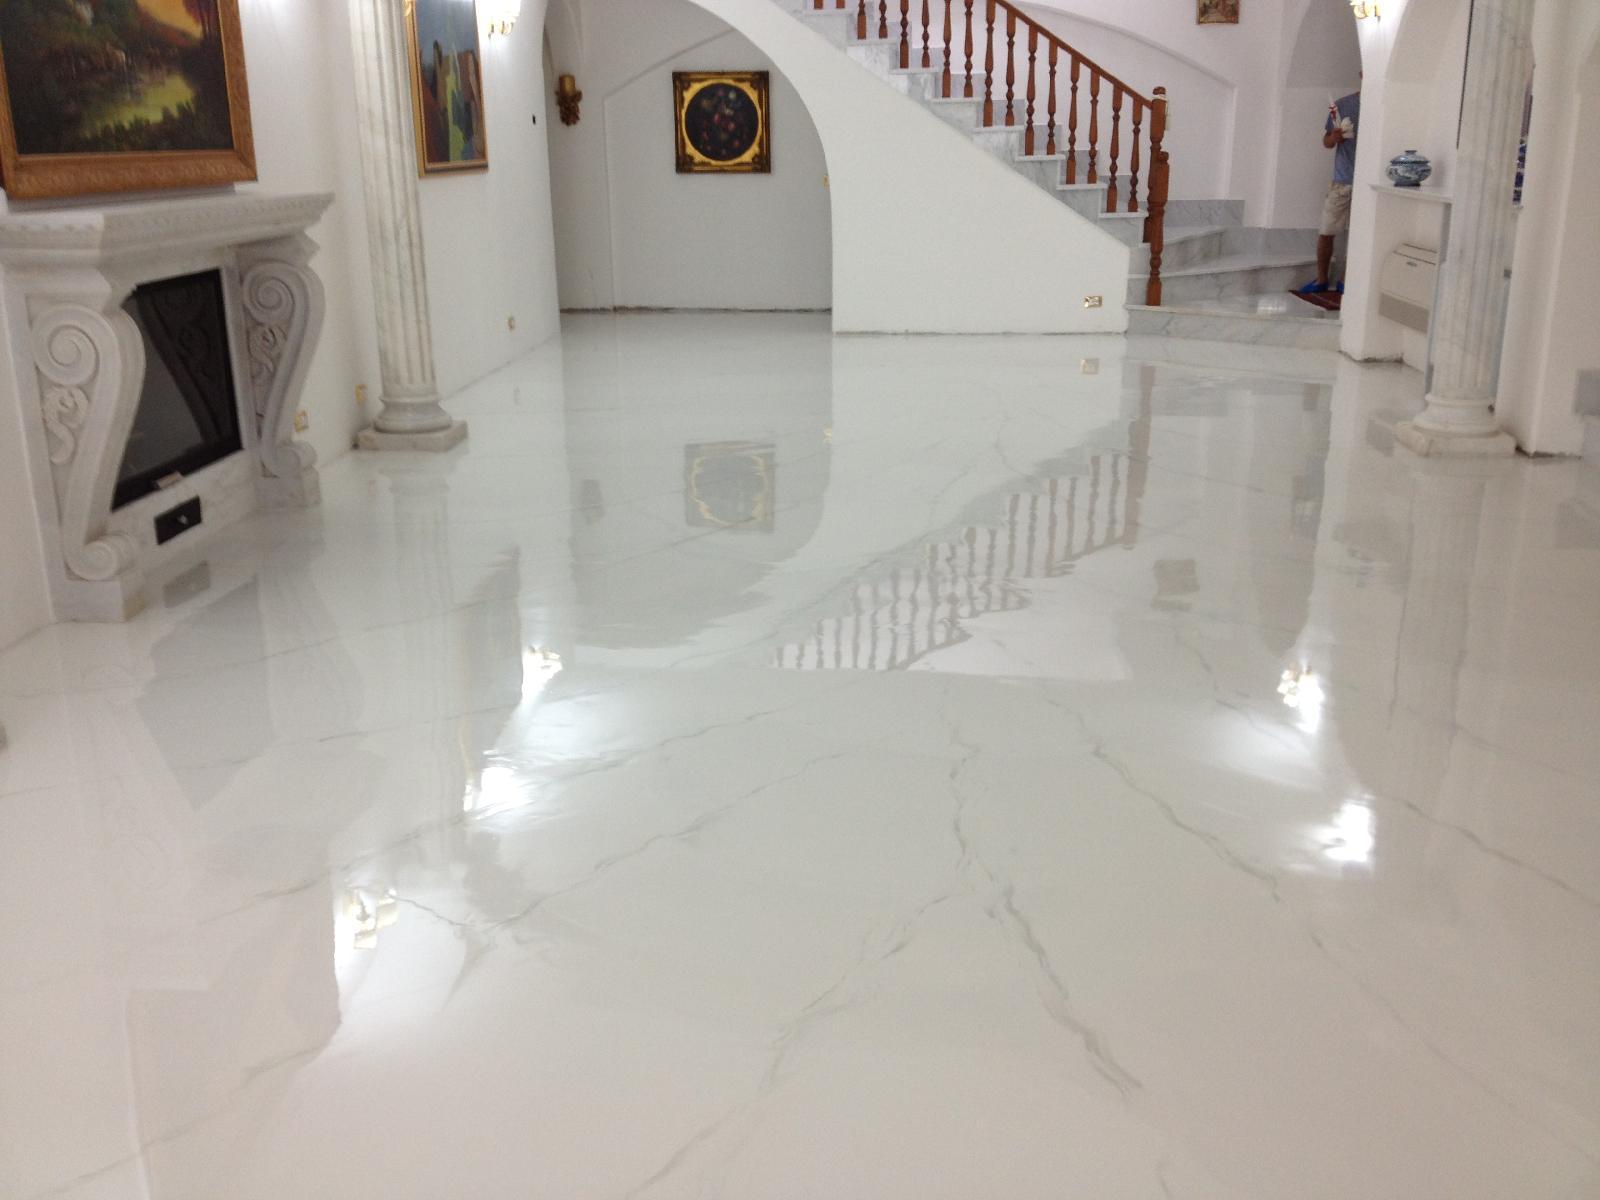 Pavimento Bianco Lucido Prezzo : Pavimento resina bianca lucida i prezzi dei pavimenti in resina